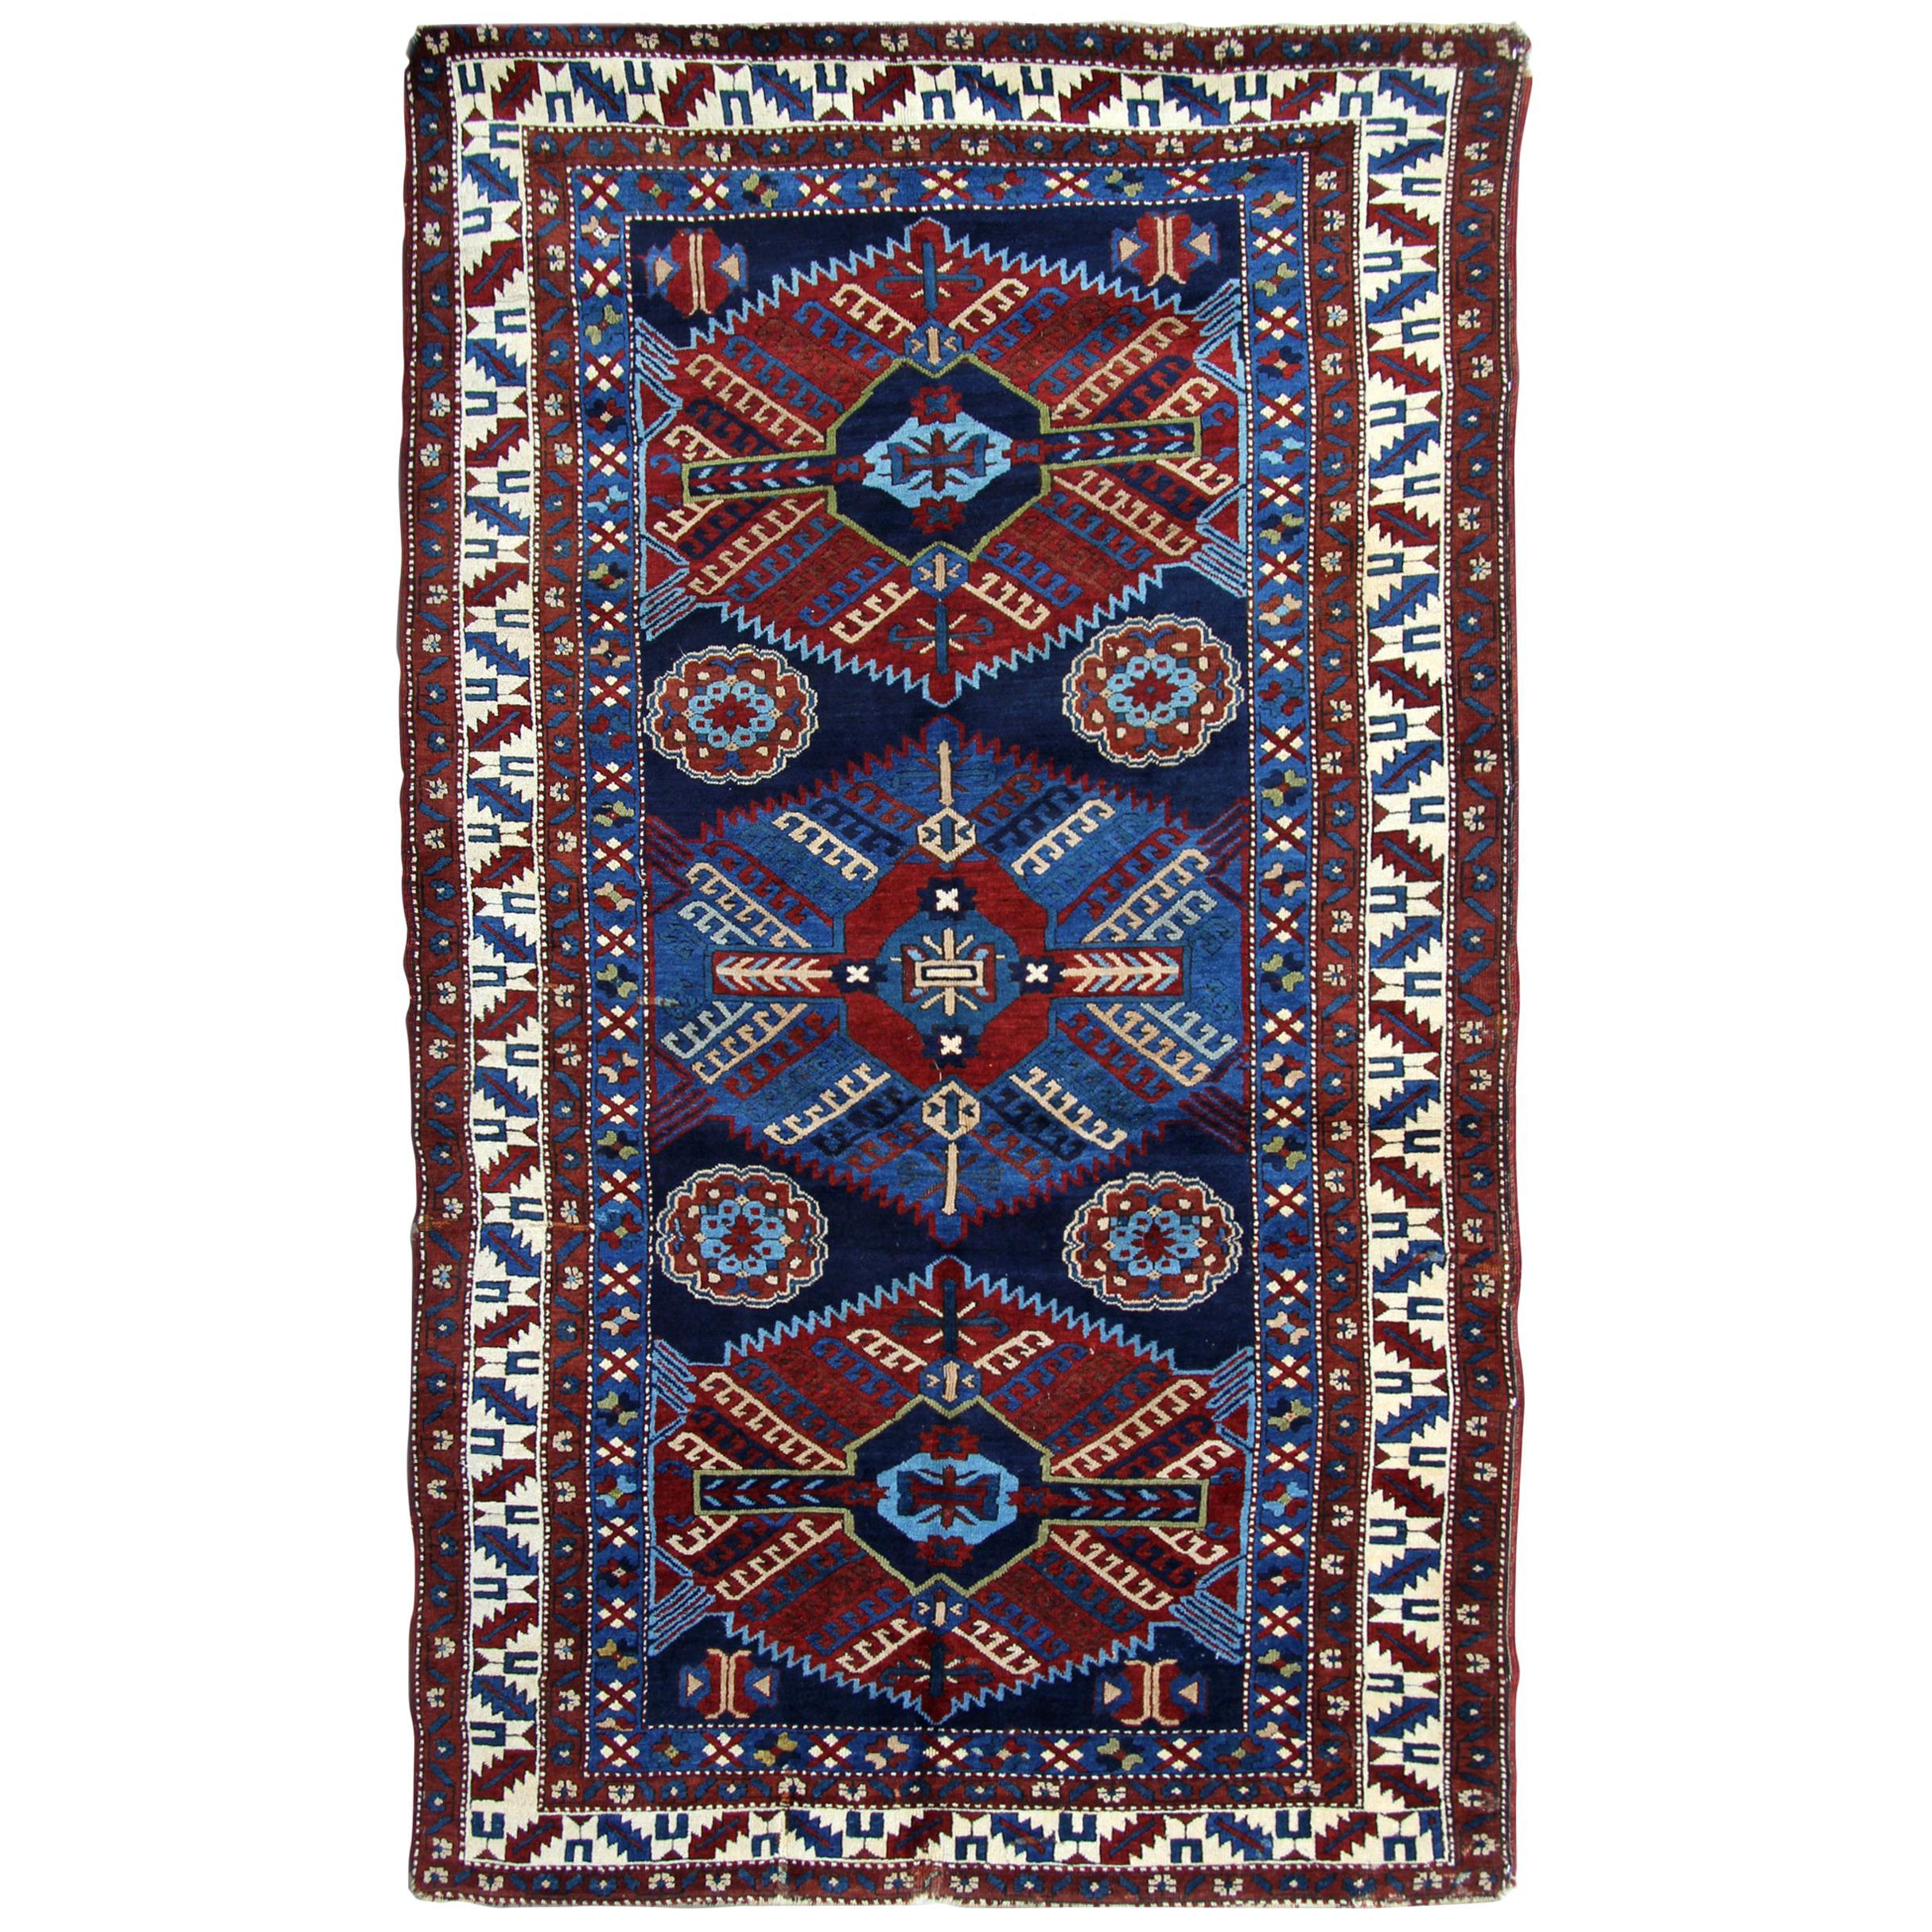 Antique Rugs Caucasian Kazak Rug, Handmade Carpet Blue Oriental Rug for Sale